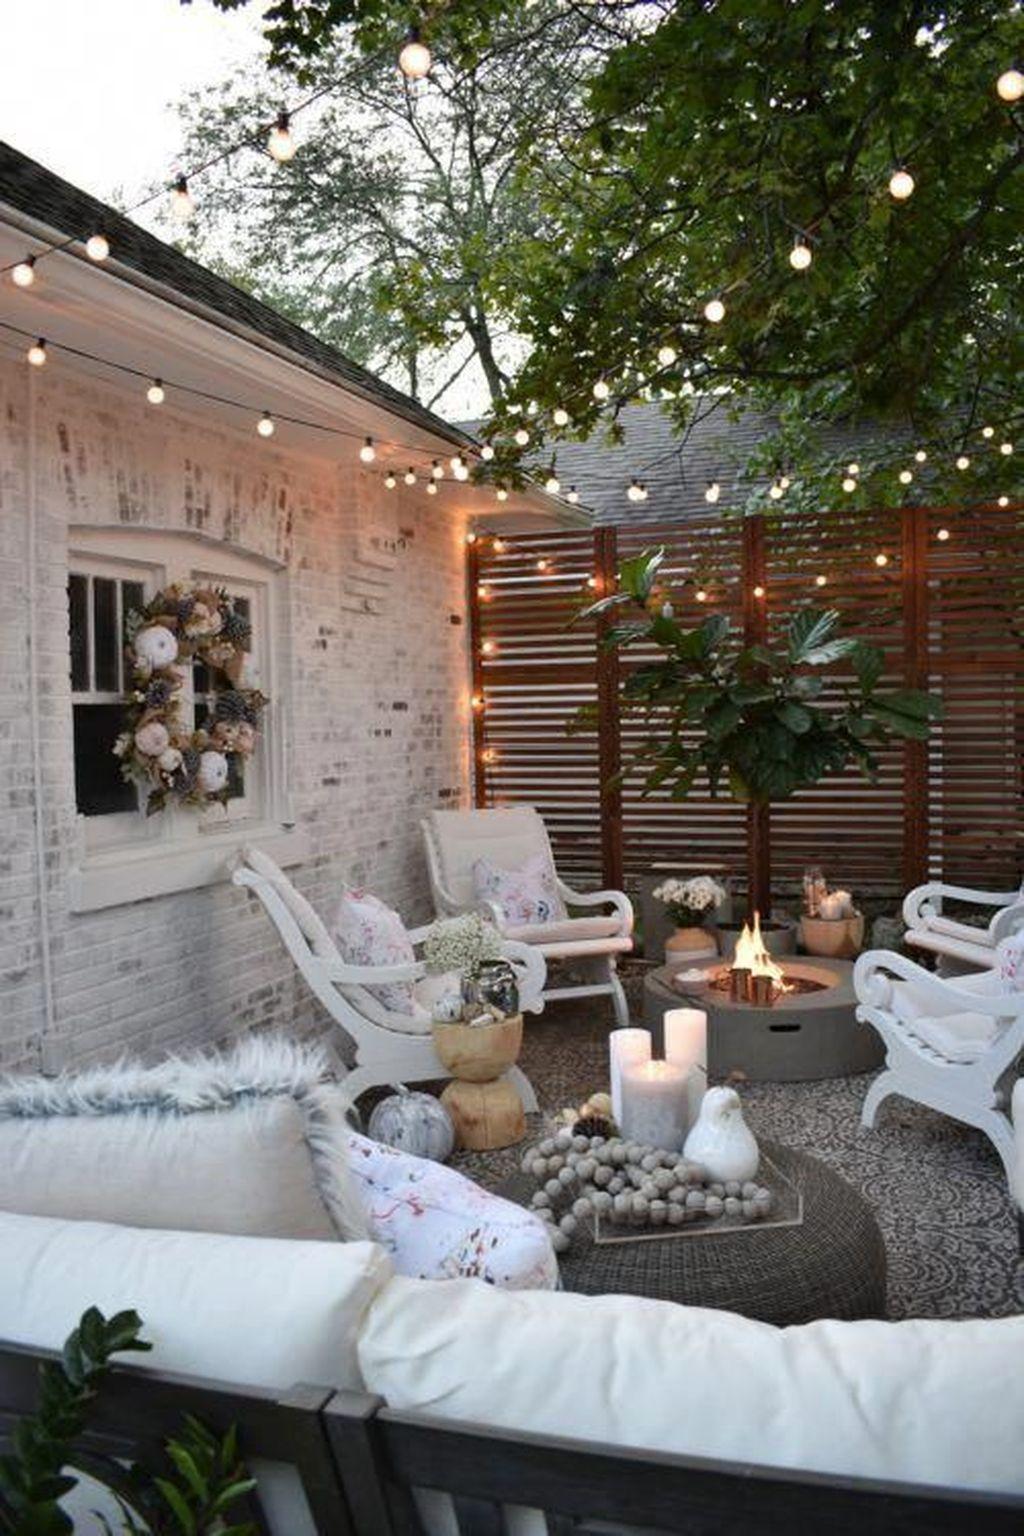 The Best Romantic Backyard Decorating Ideas 03